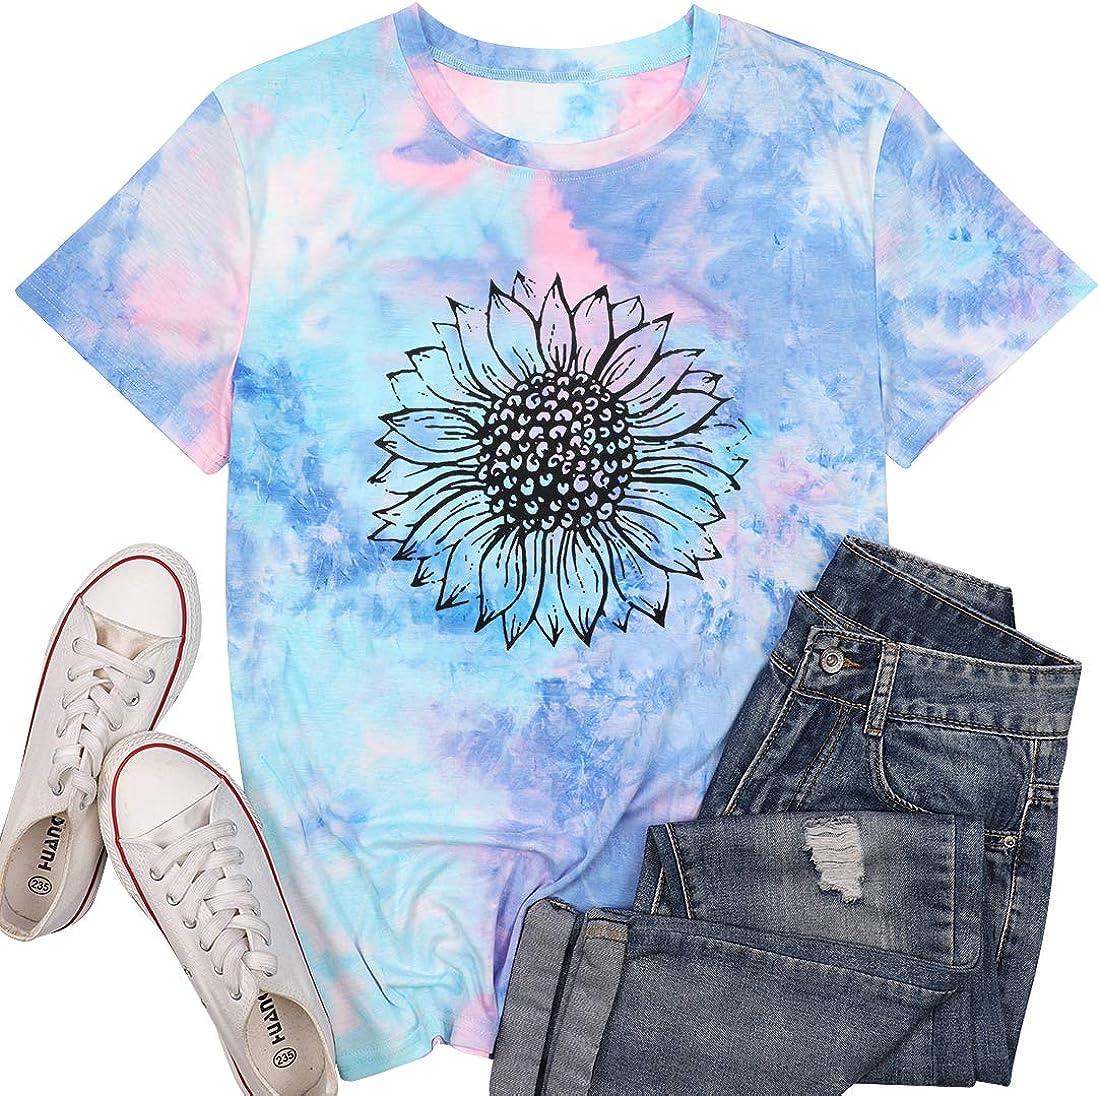 Sunflower Tie Dye Short Sleeve Shirt